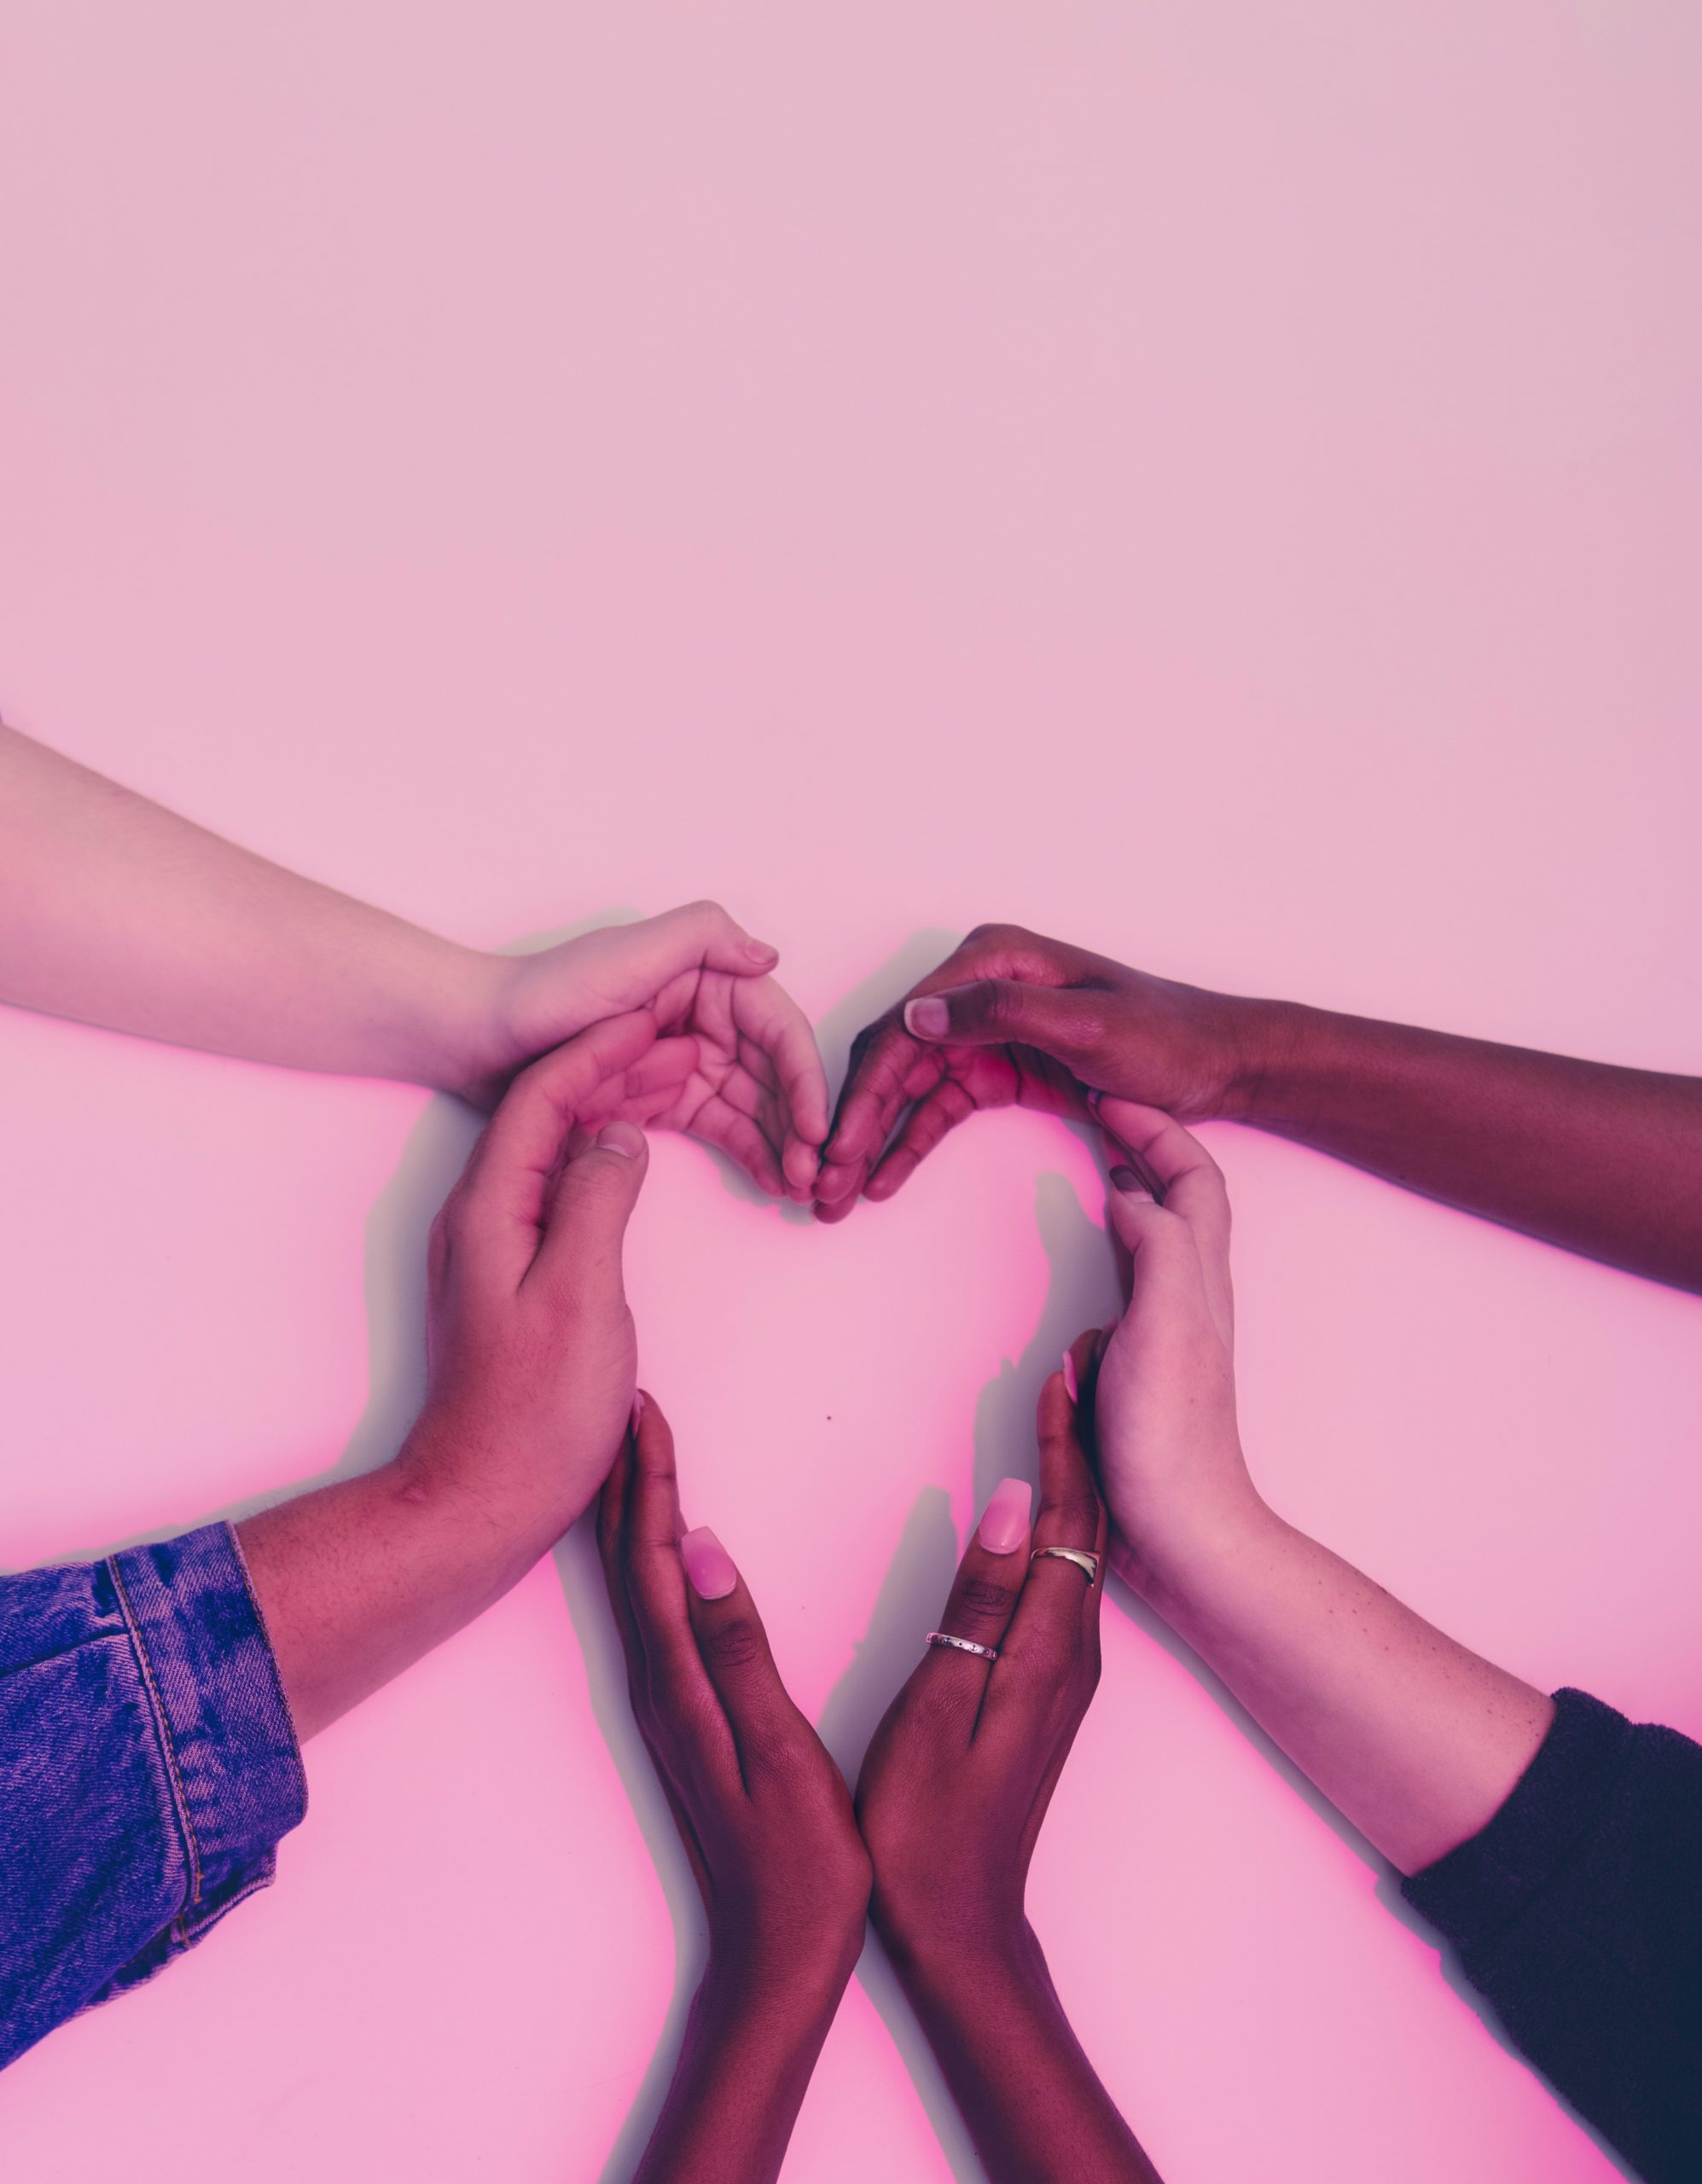 hands-heart-love-305530